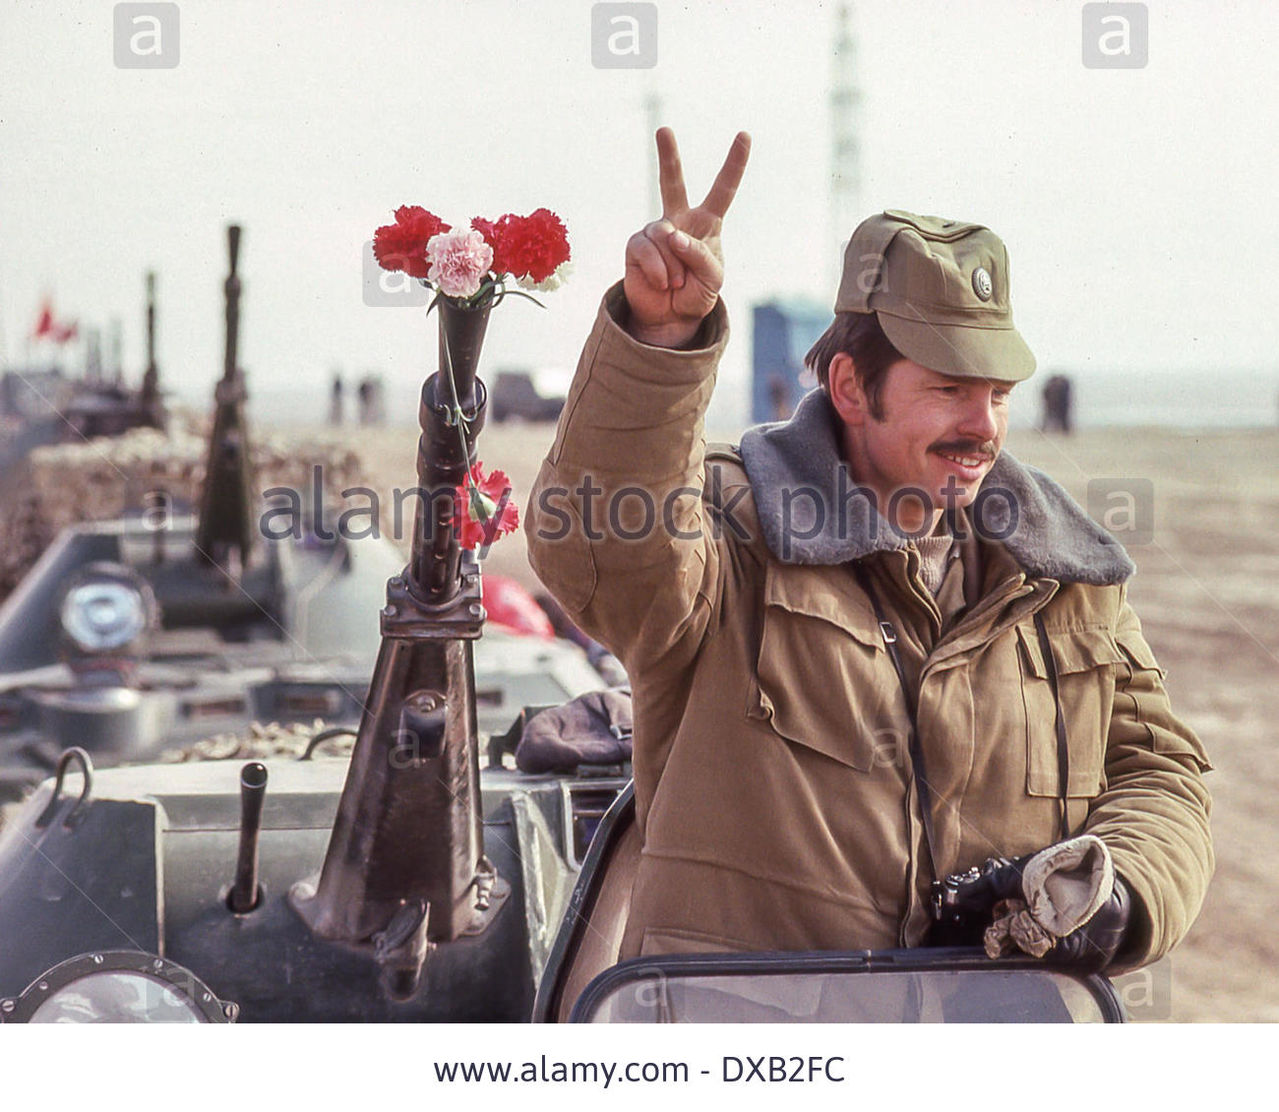 Soviet Afghanistan war - Page 5 Feb_16_1989_termez_uzbekistan_ru_standing_atop_a